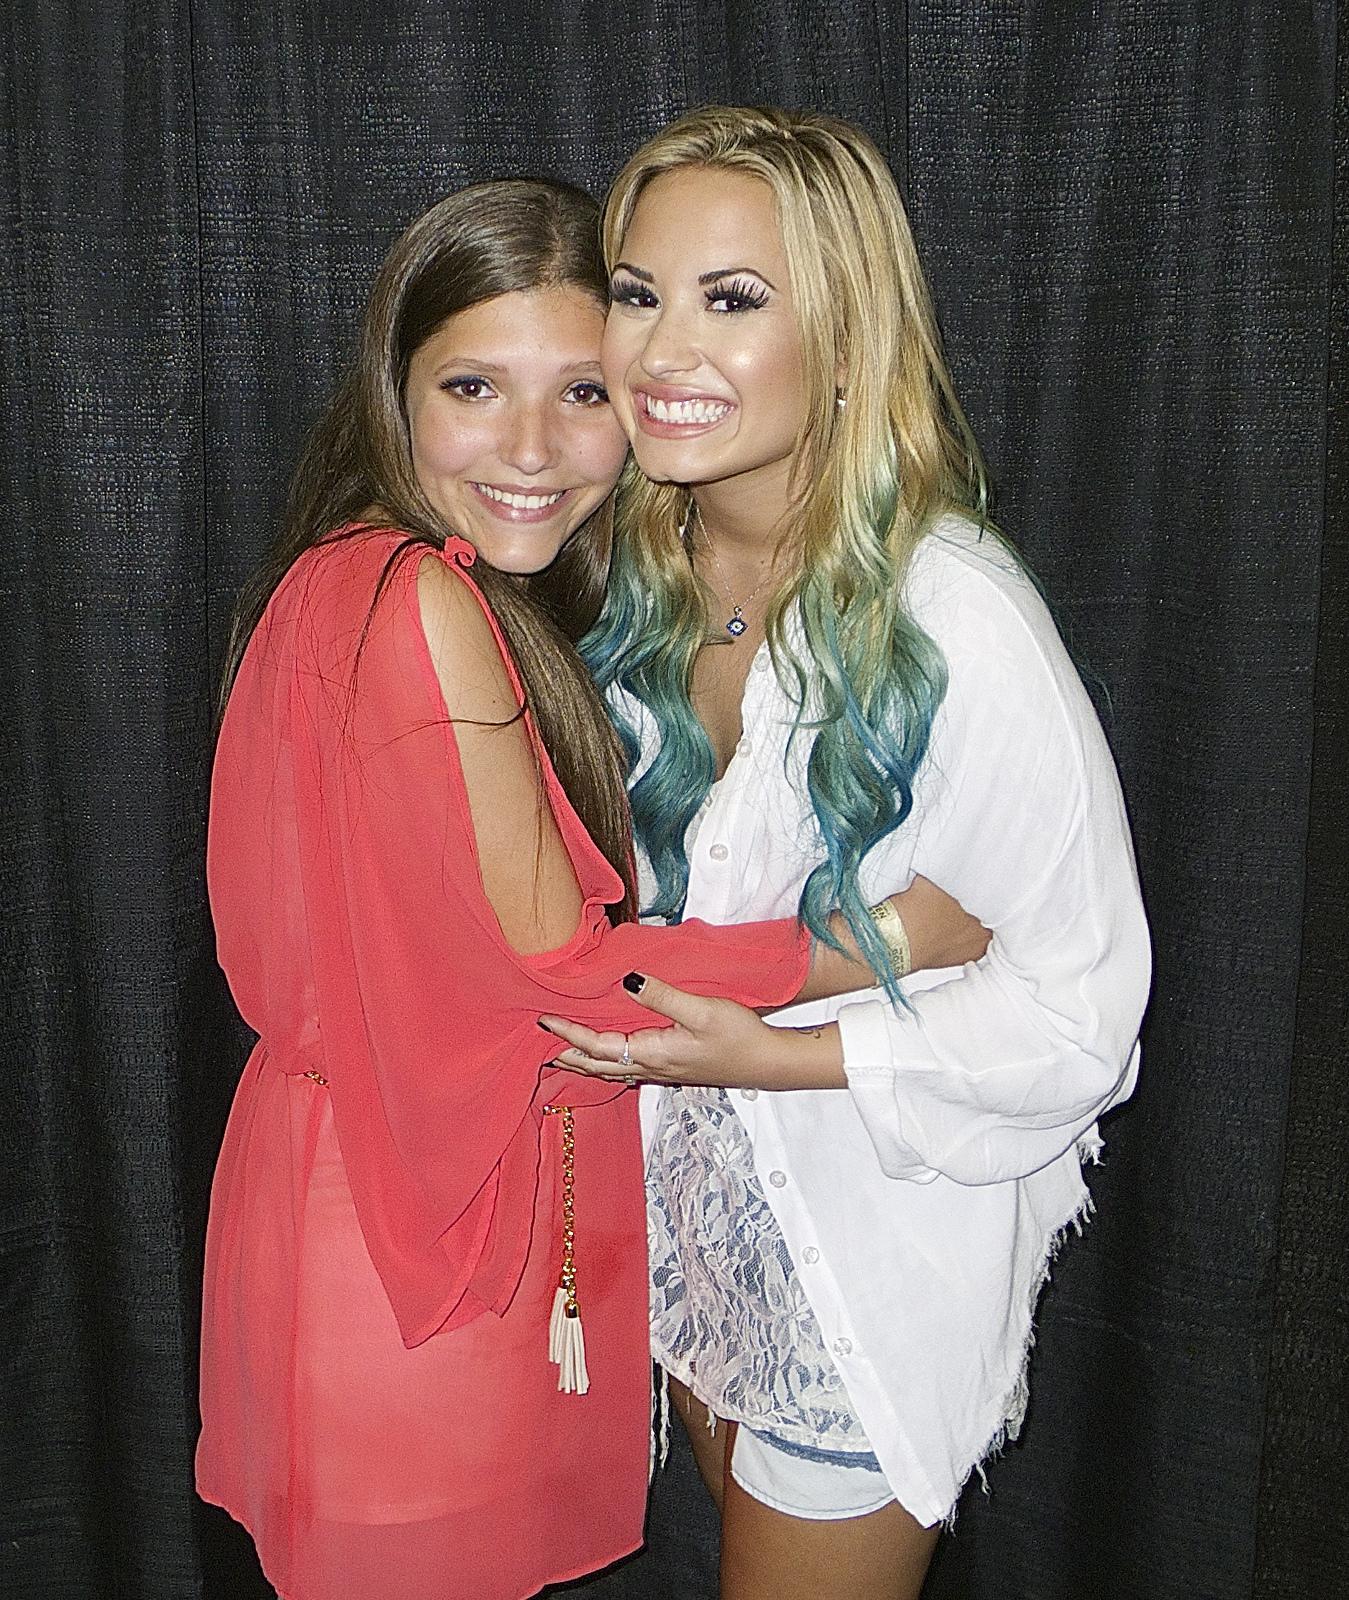 http://1.bp.blogspot.com/-PkHJPeOzzBc/UEZnLDHykqI/AAAAAAAAAdg/tAvH8mJf09A/s1600/I+met+Demi+Lovato+and+me+hug.jpg